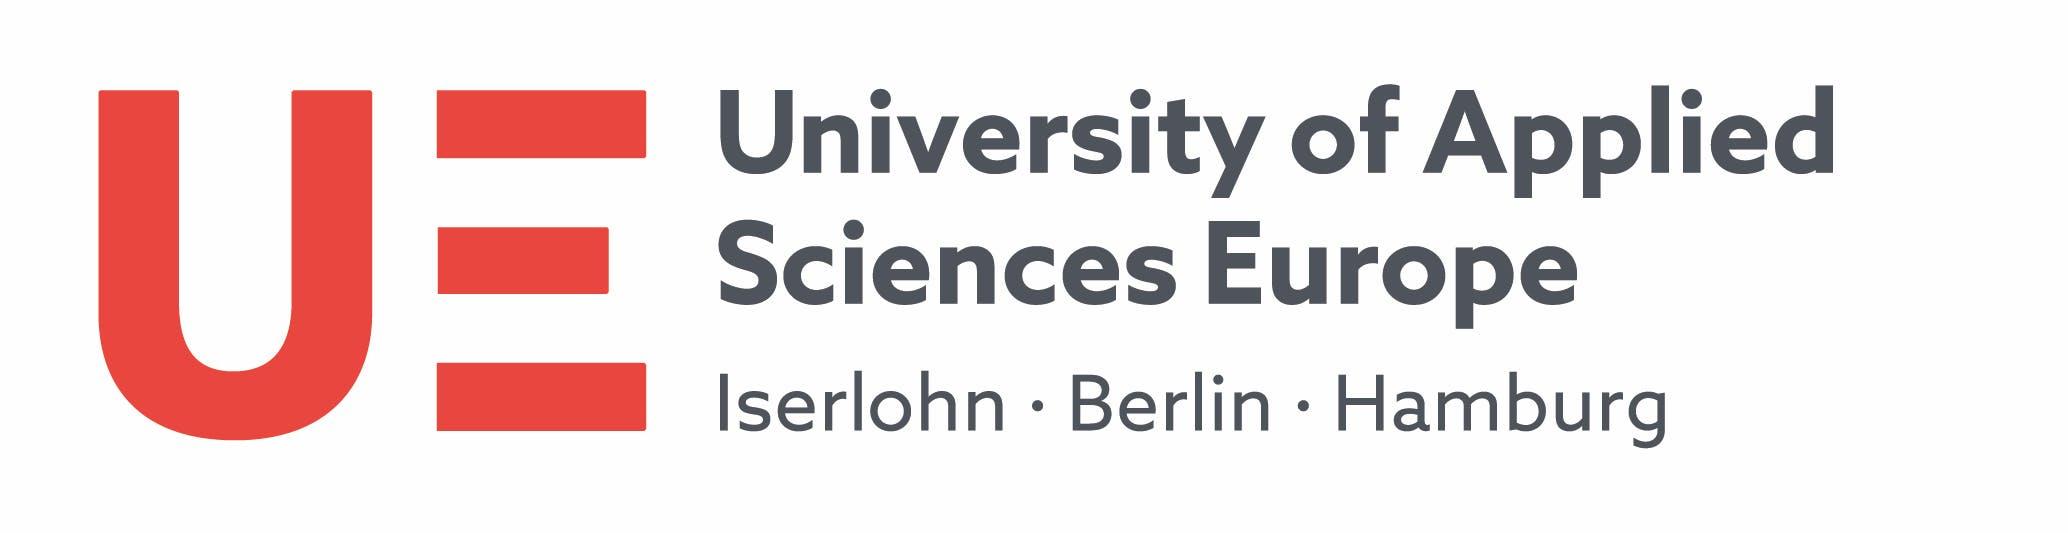 University of Applied Sciences Europe - Berlin - Germany